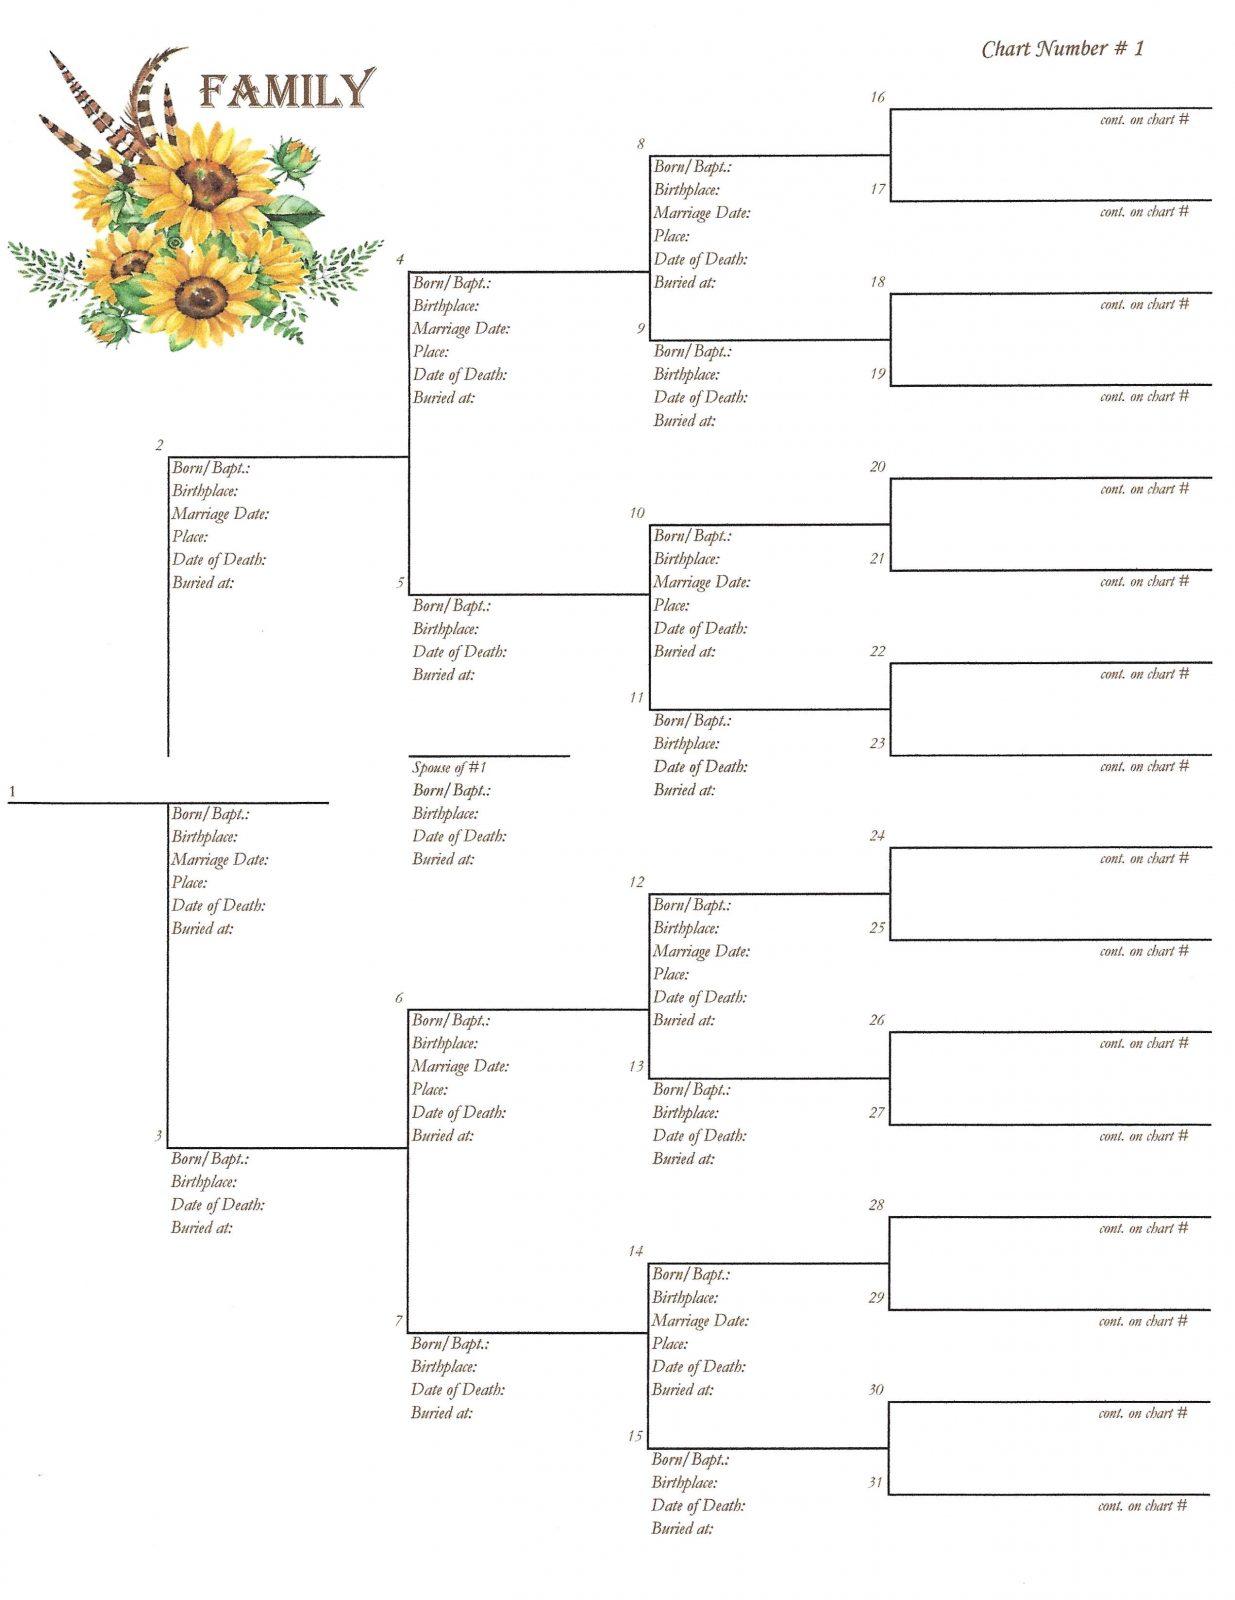 Family Downloadable Pedigree Chart 1